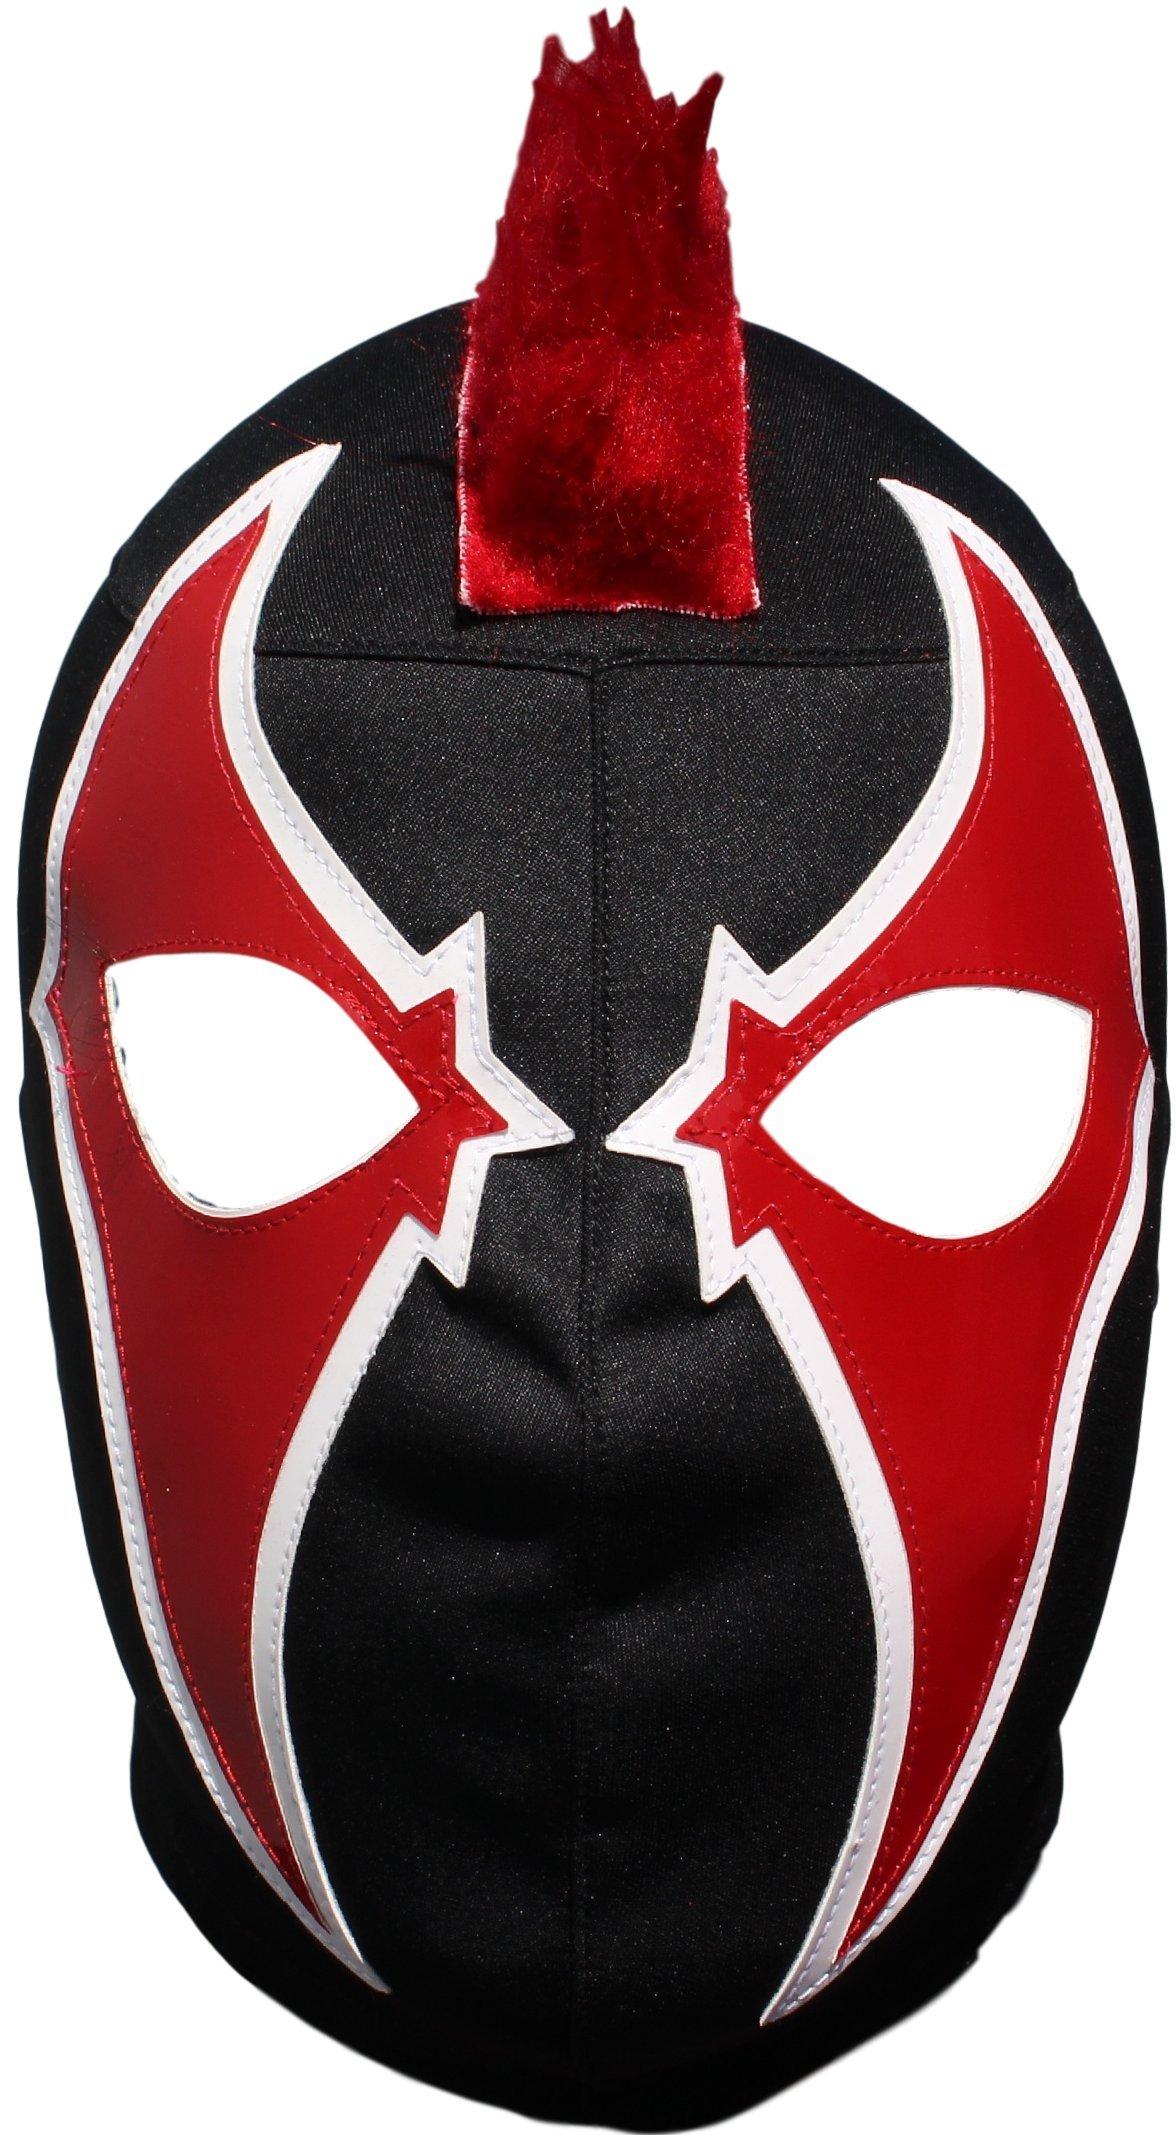 Deportes Martinez Crazy Clown Lycra Lucha Libre Luchador Wrestling Masks Adult Size Red by Deportes Martinez